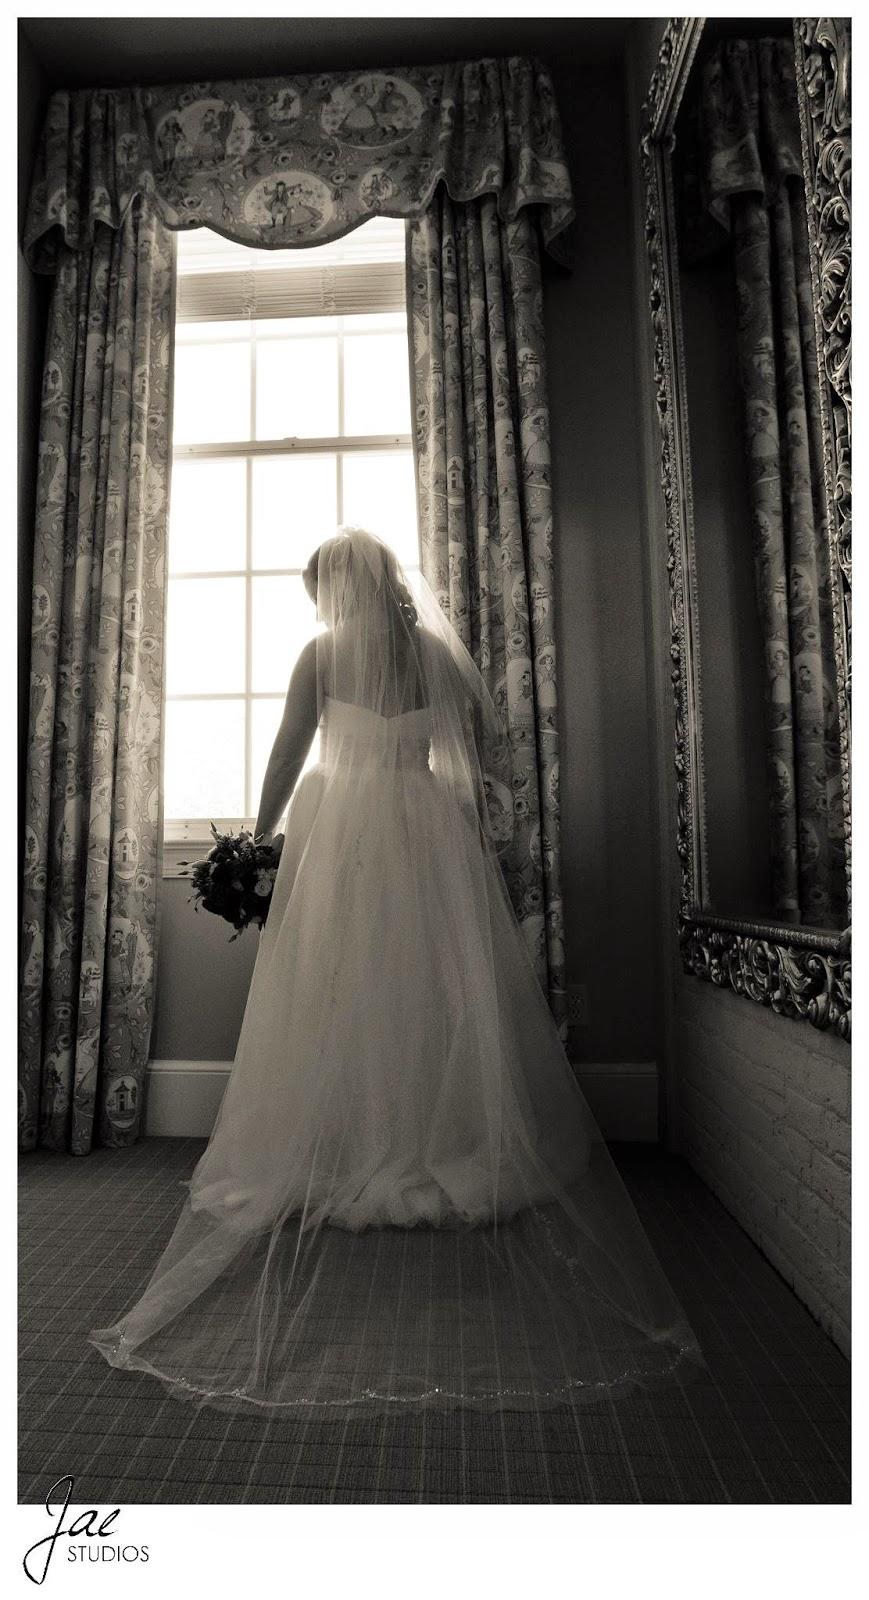 Jonathan and Julie, Bird cage, West Manor Estate, Wedding, Lynchburg, Virginia, Jae Studios, wedding dress, black and white, window, flowers, bouquet, mirror, veil